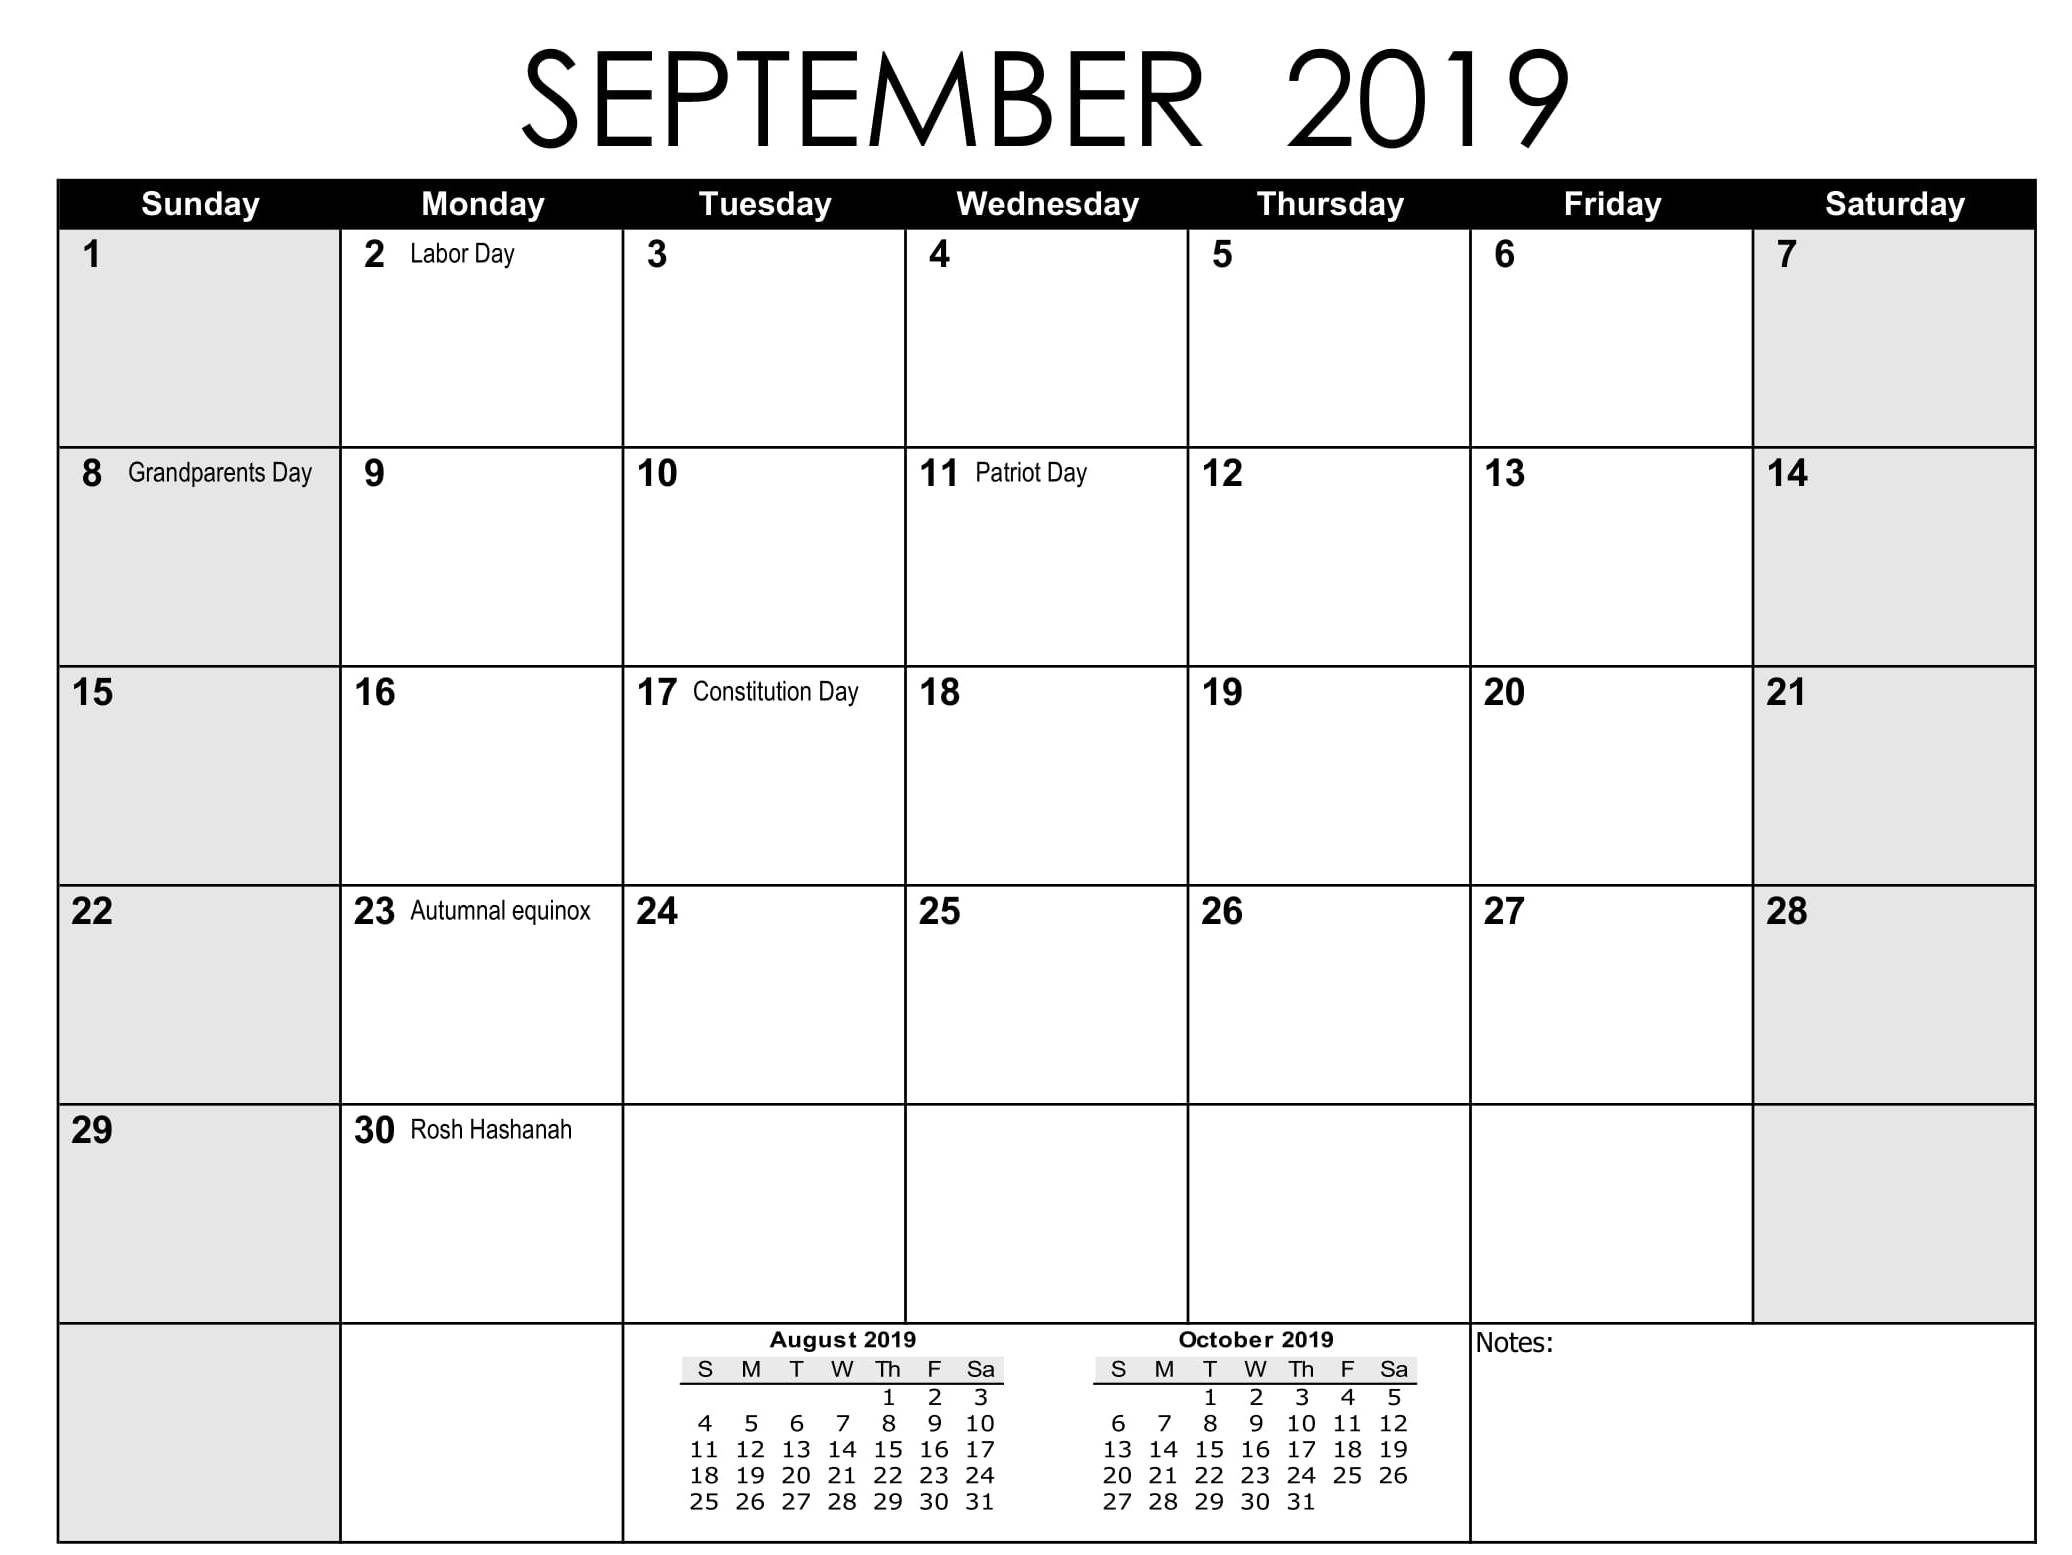 September 2019 Calendar US School Holidays